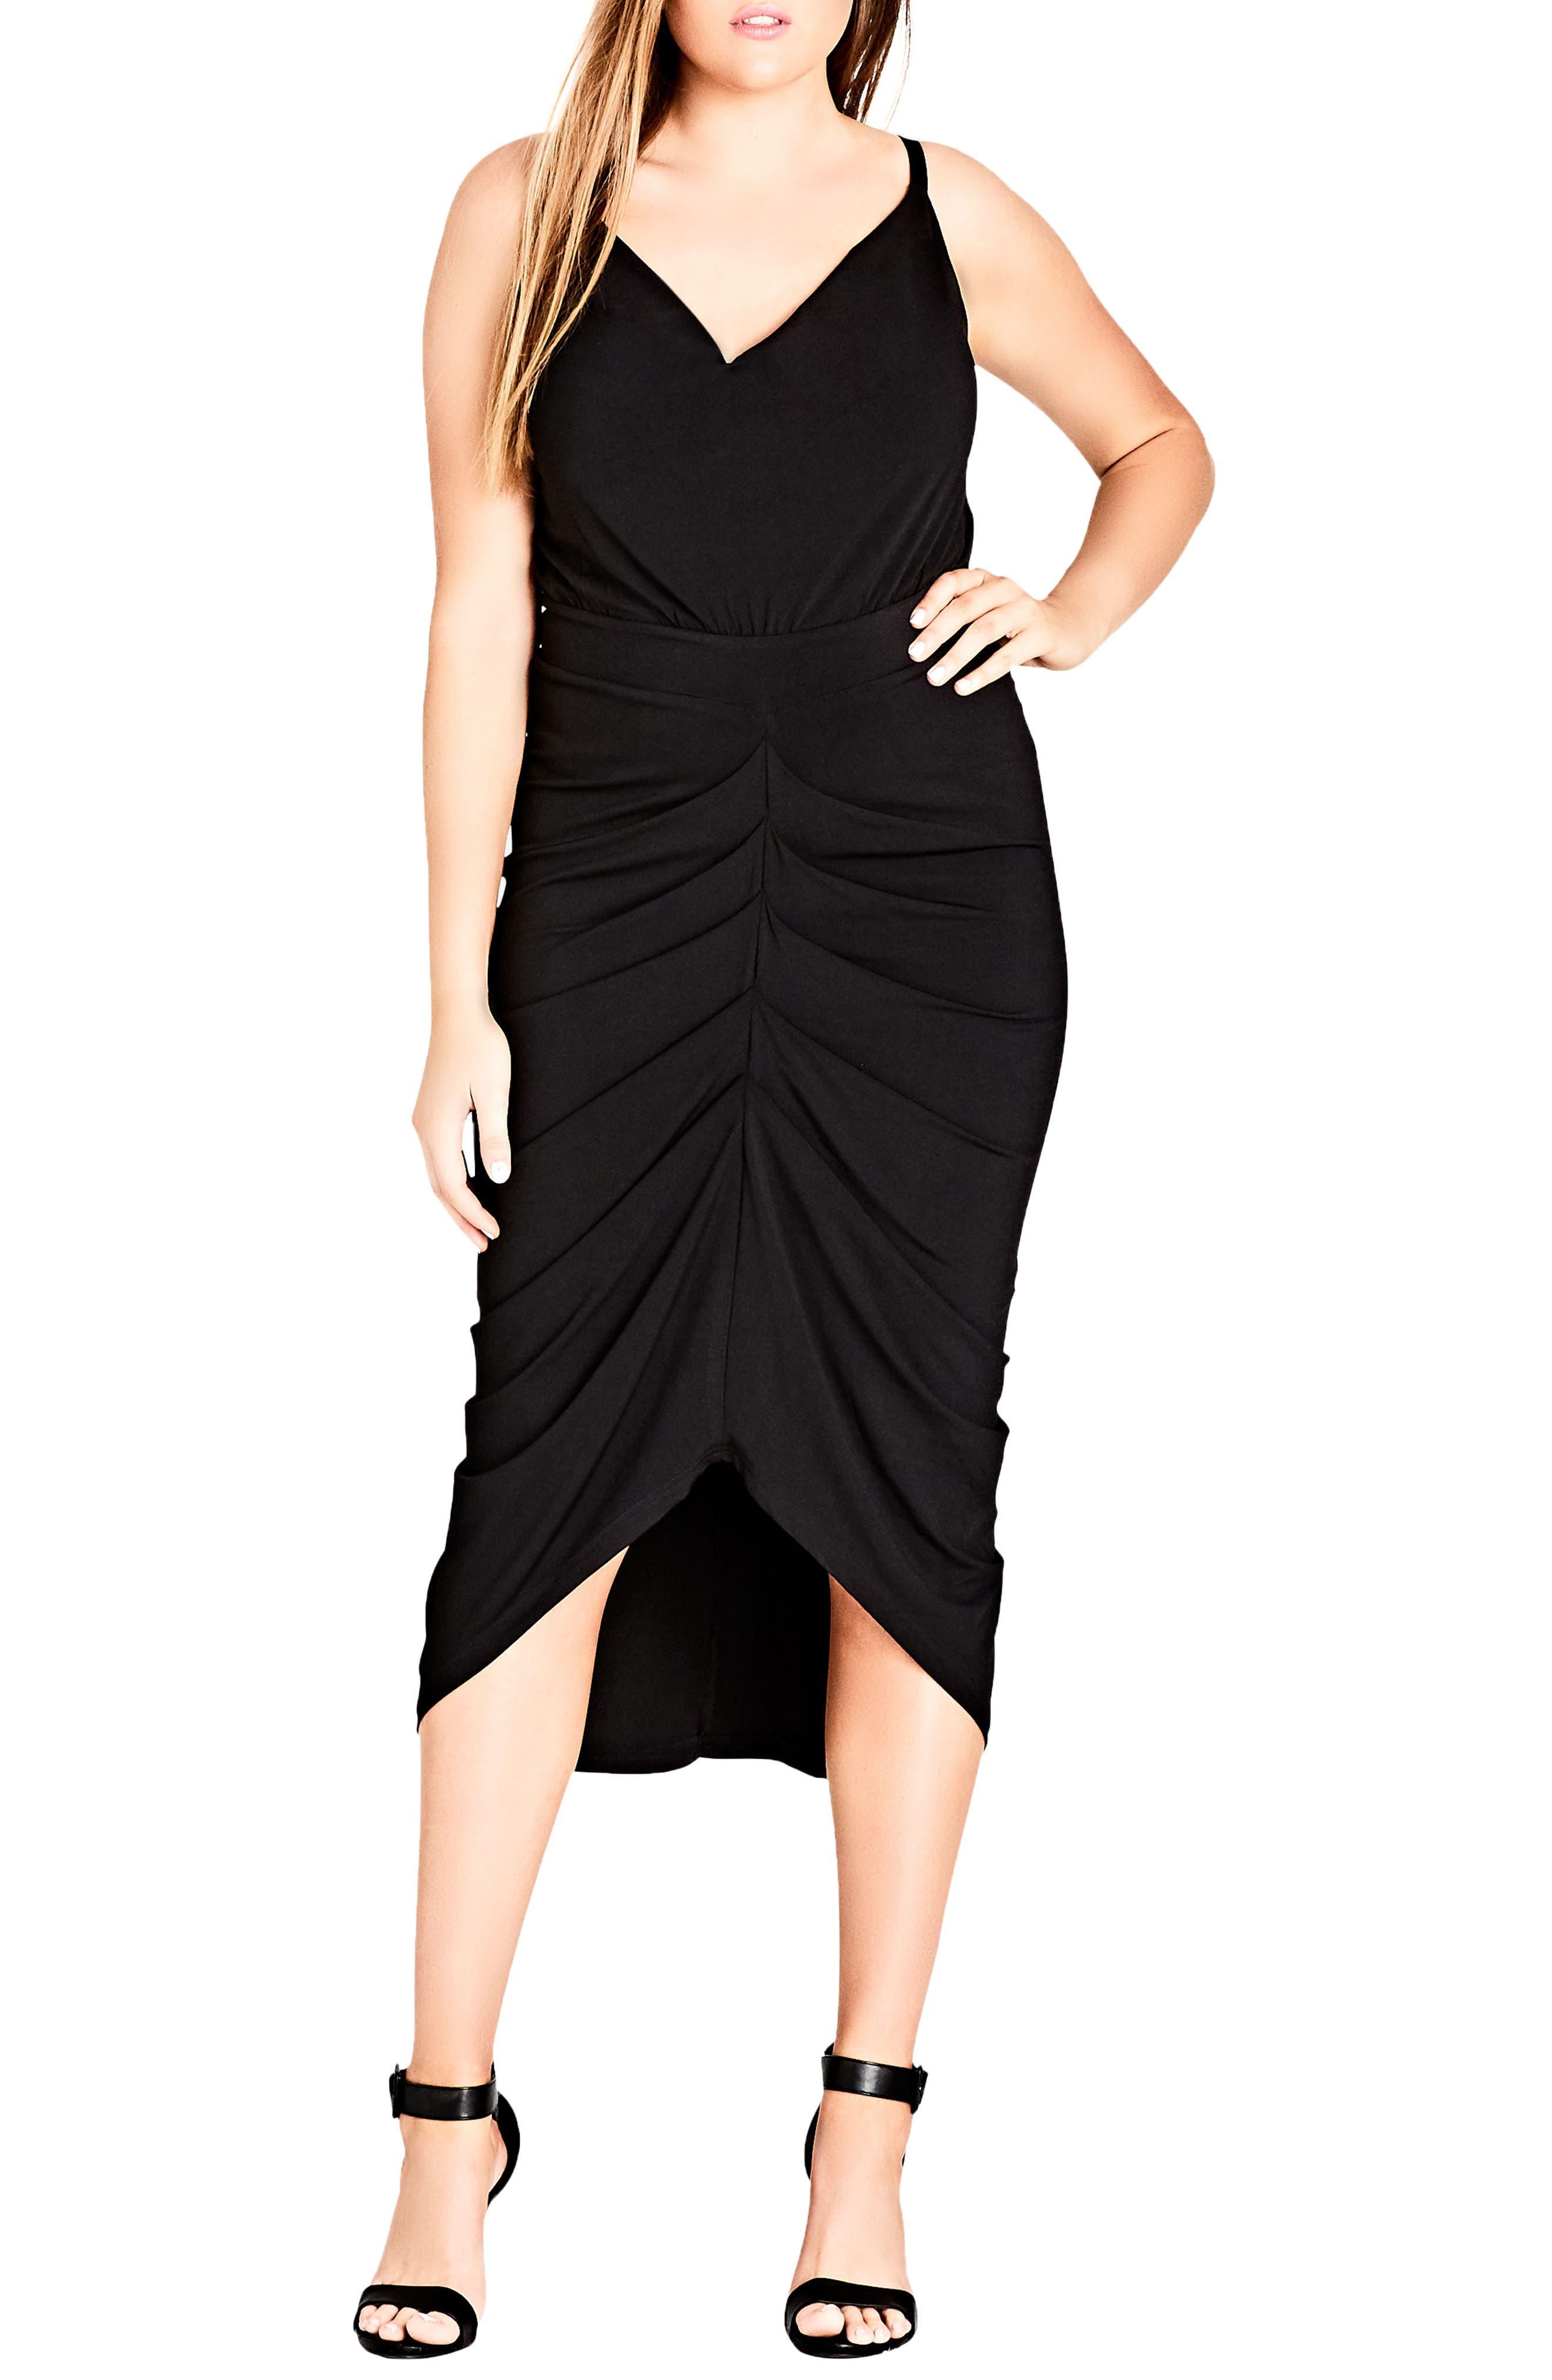 Temptress Dress,                             Main thumbnail 1, color,                             Black